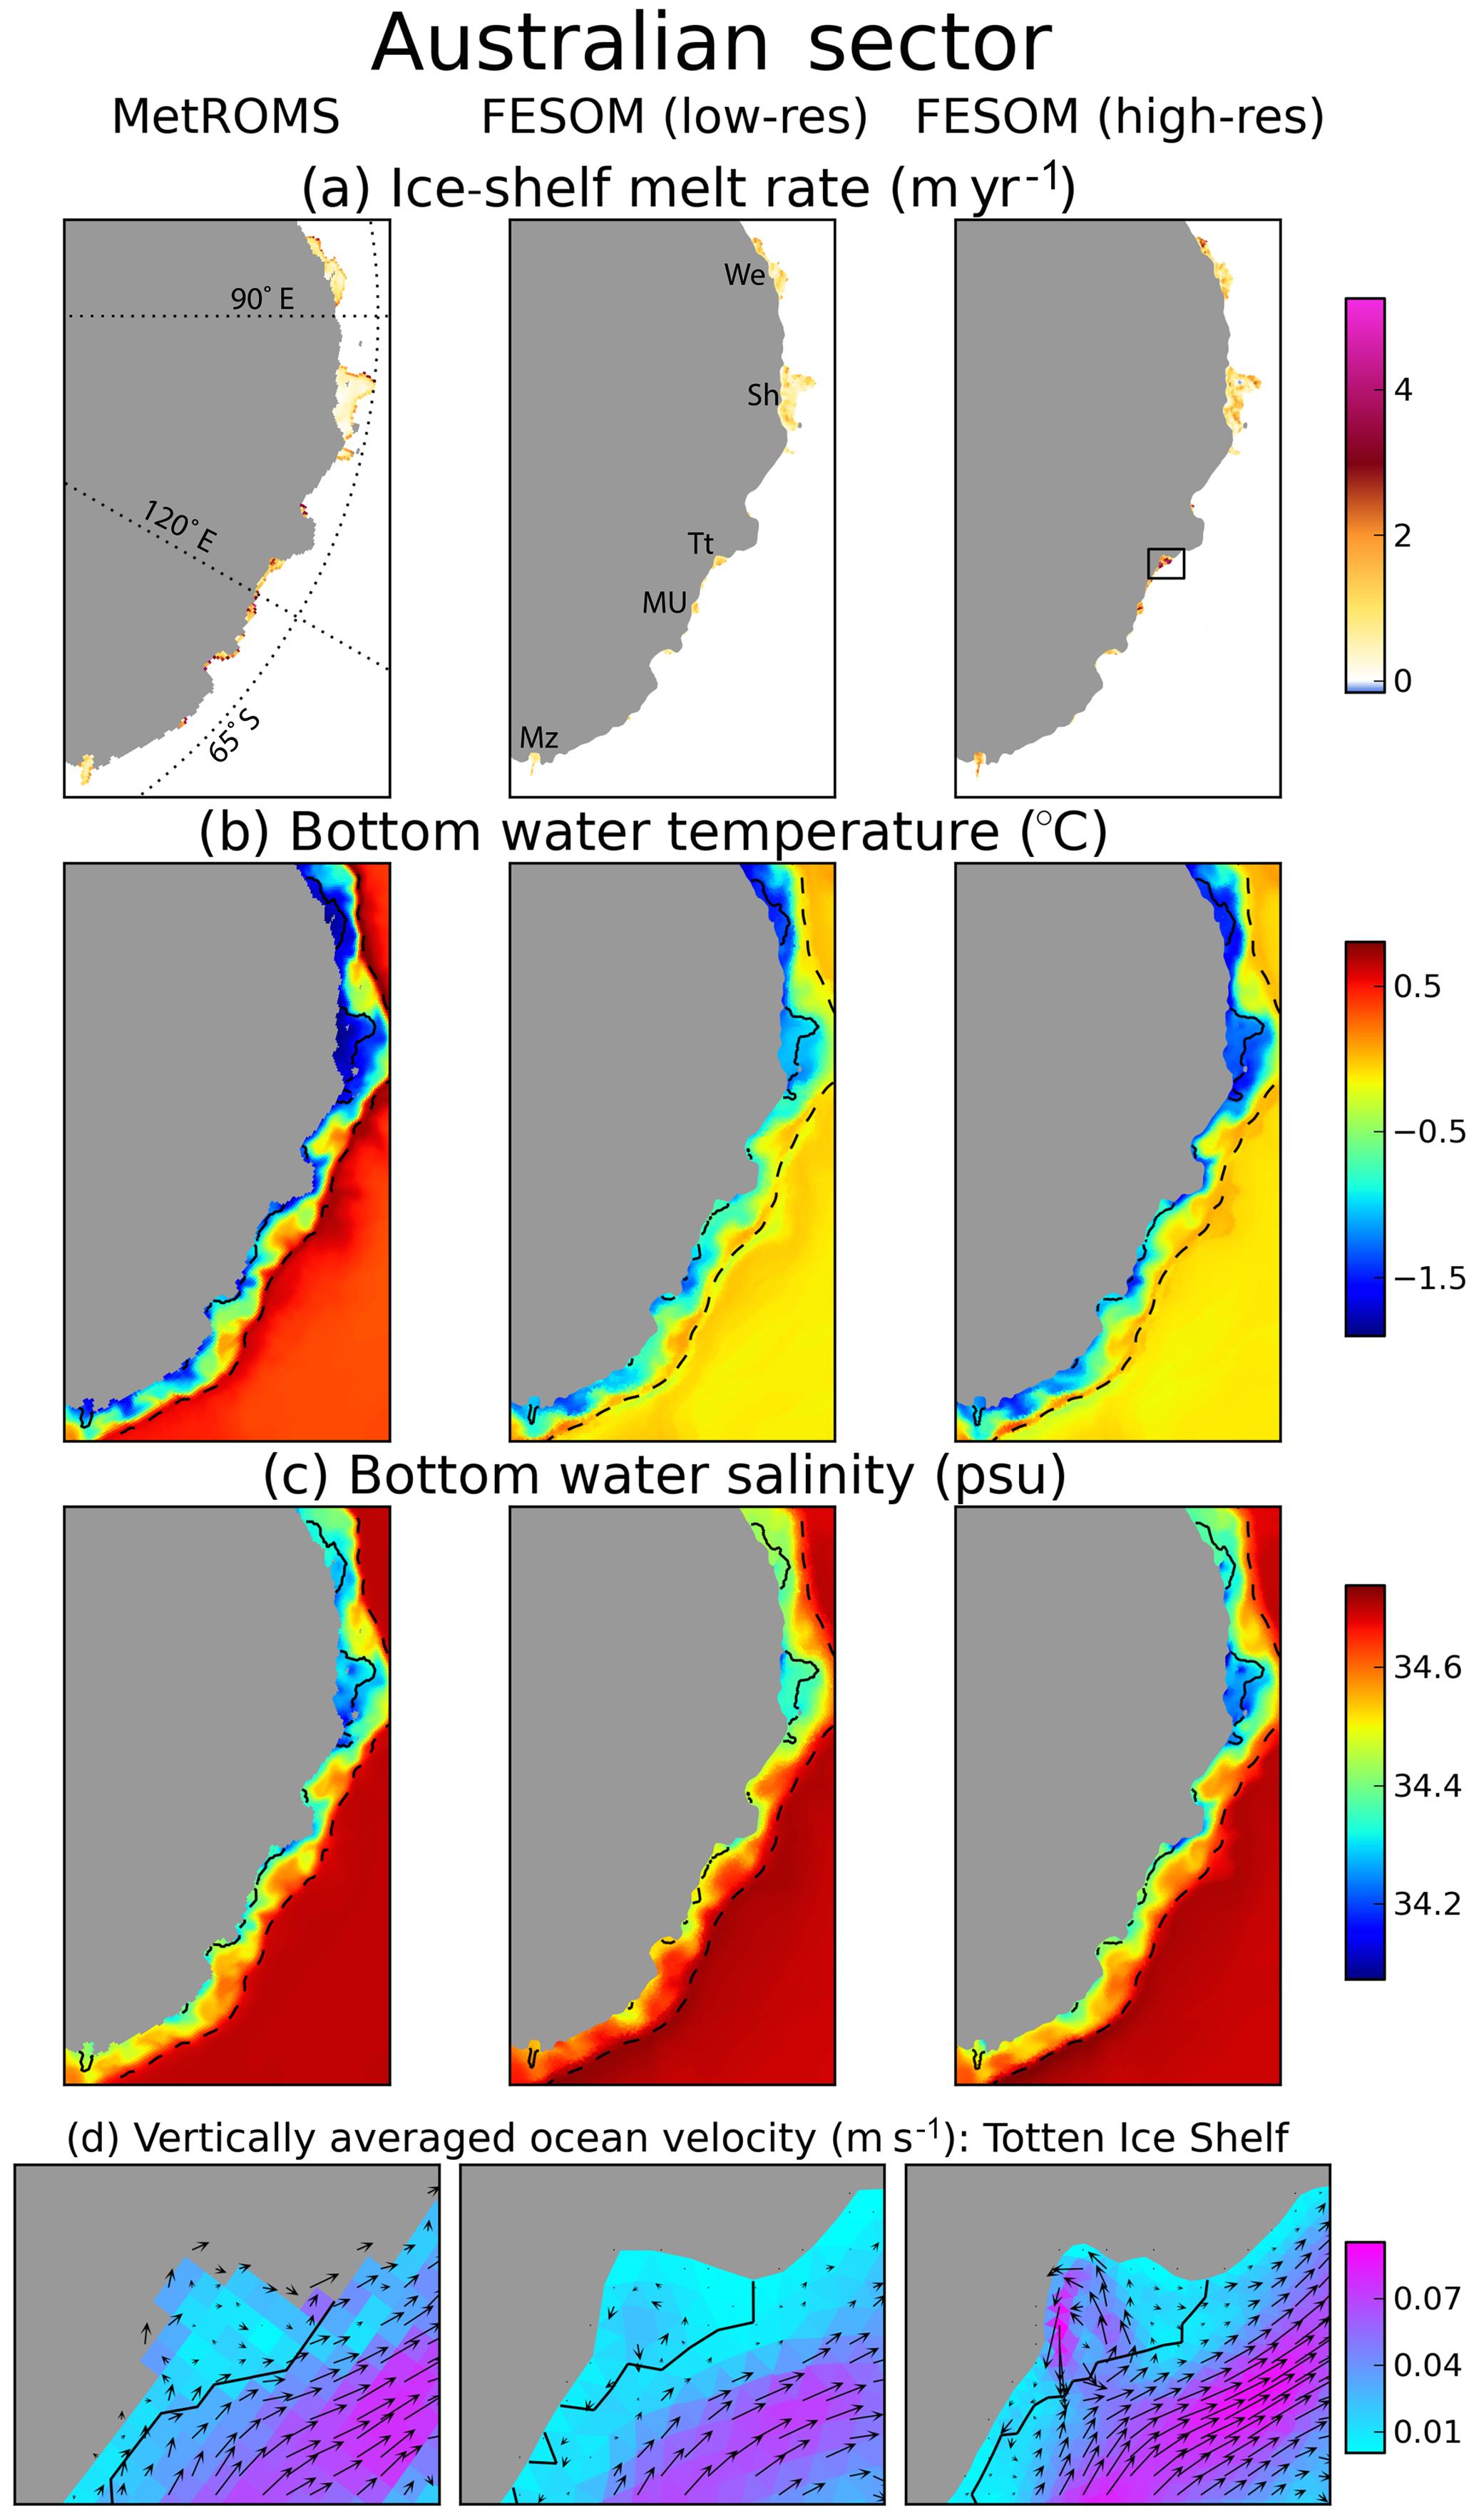 GMD - Intercomparison of Antarctic ice-shelf, ocean, and sea-ice